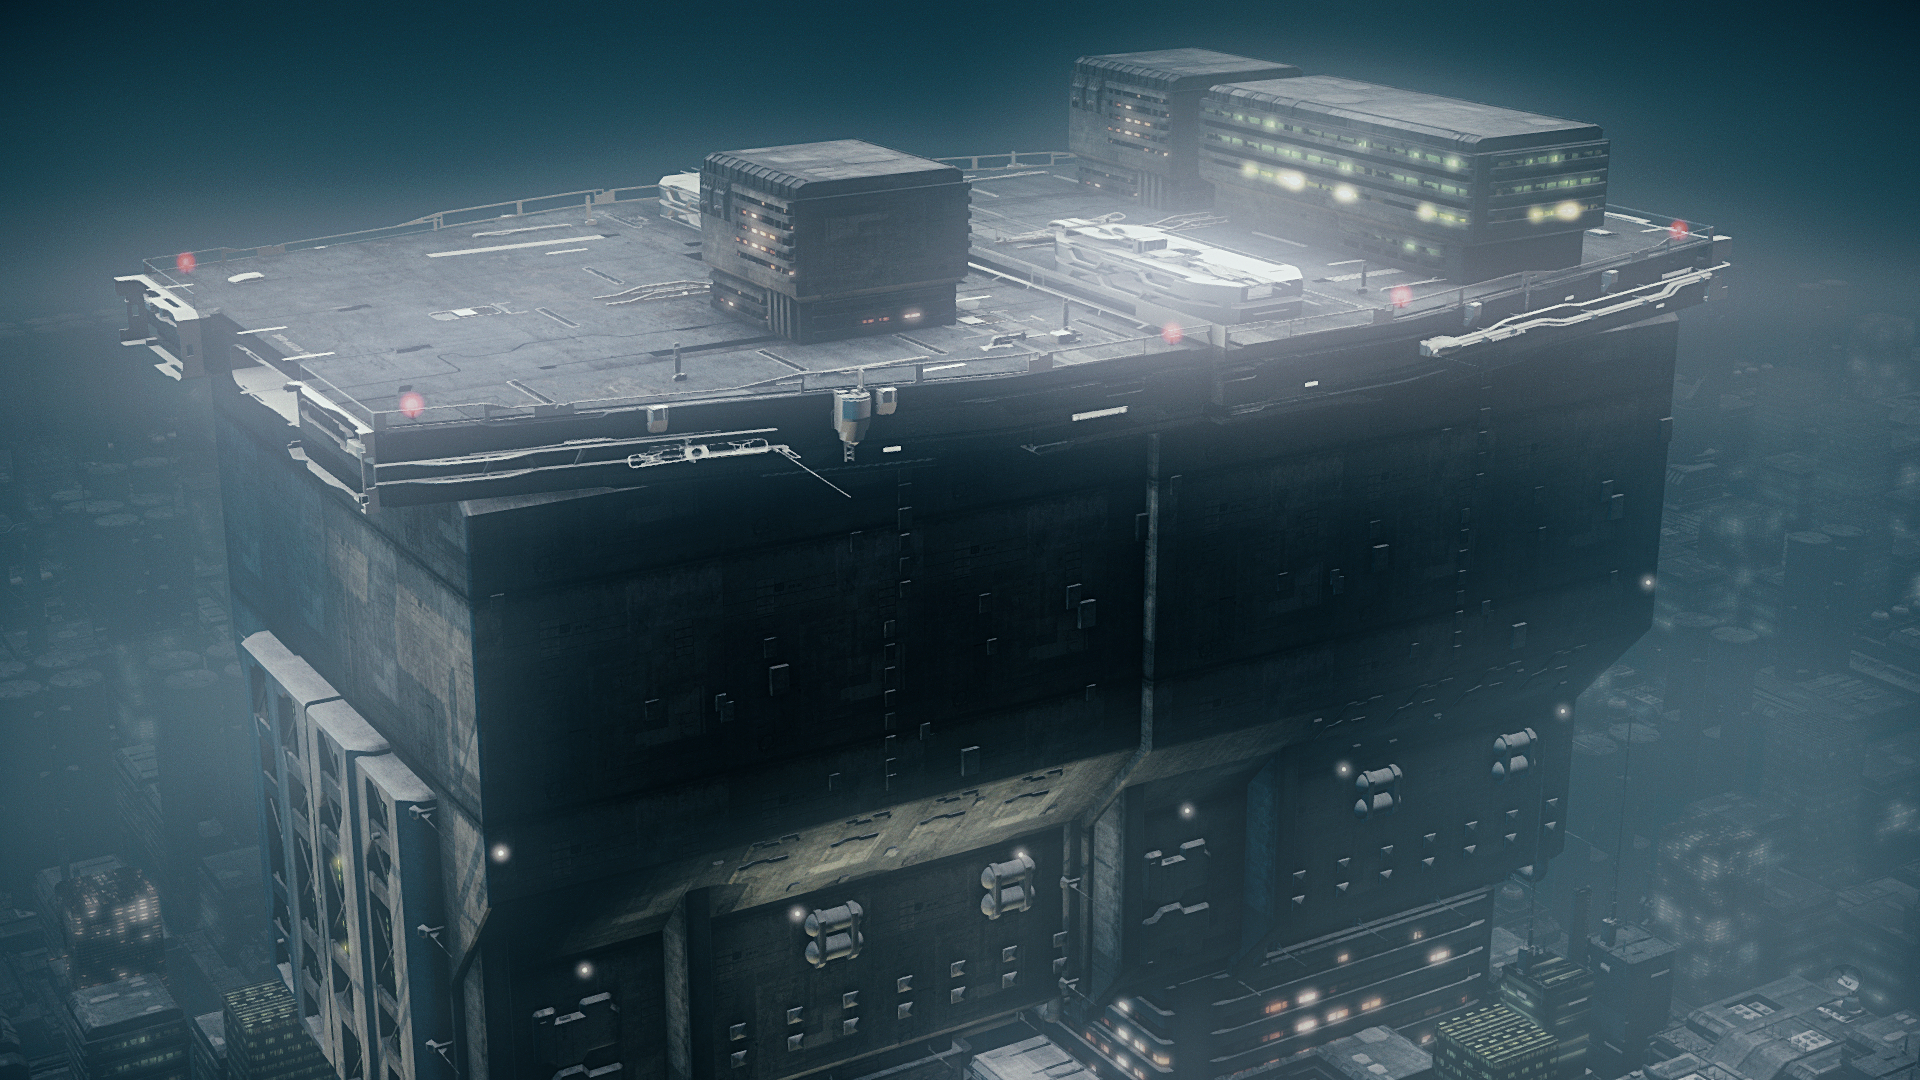 Cyberpunk sci fi environment